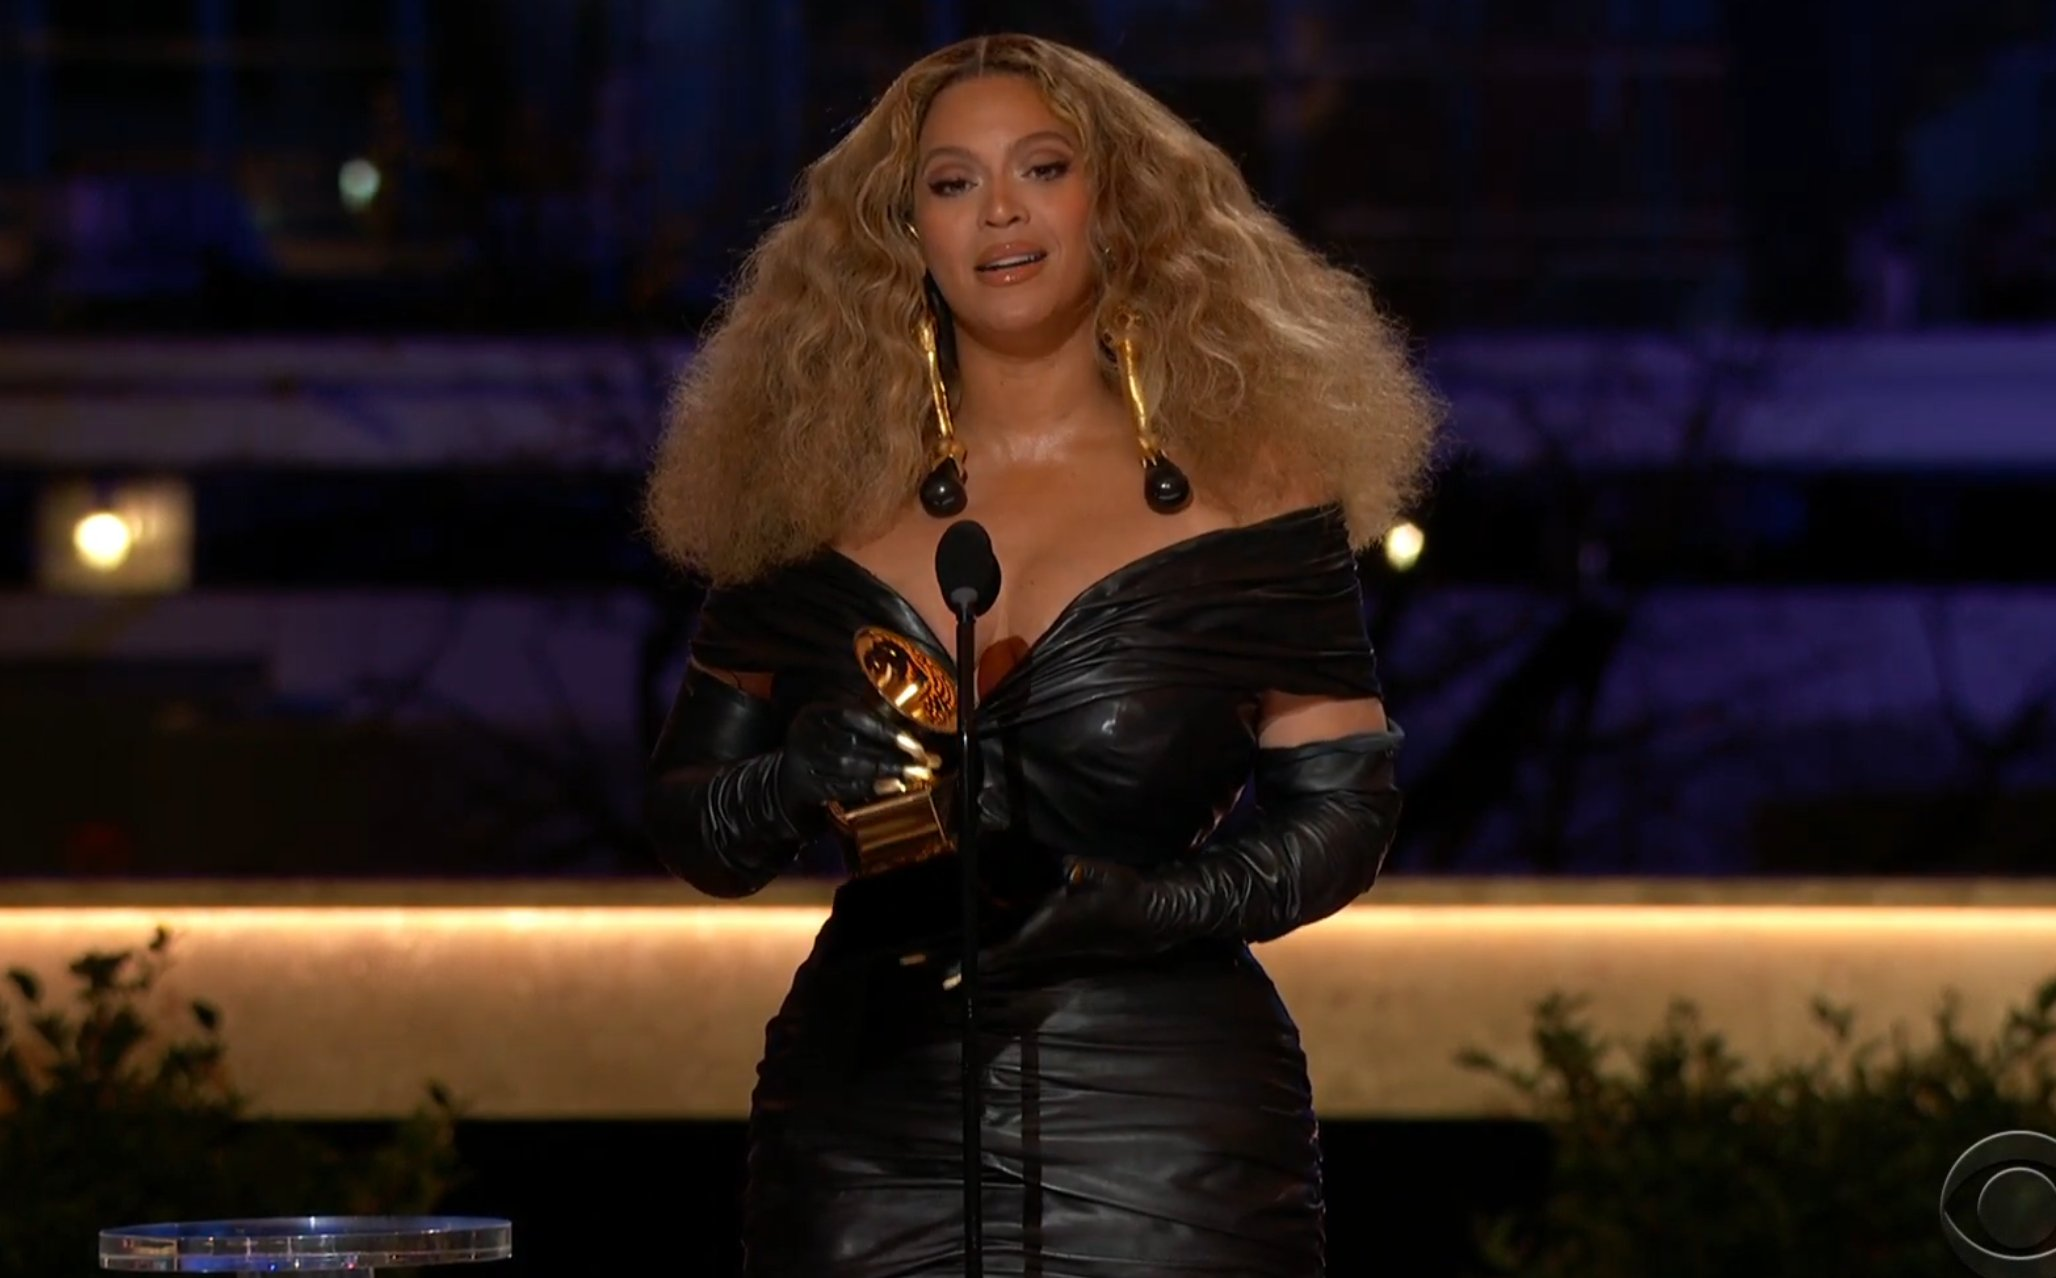 Beyonce at Grammys via CBS